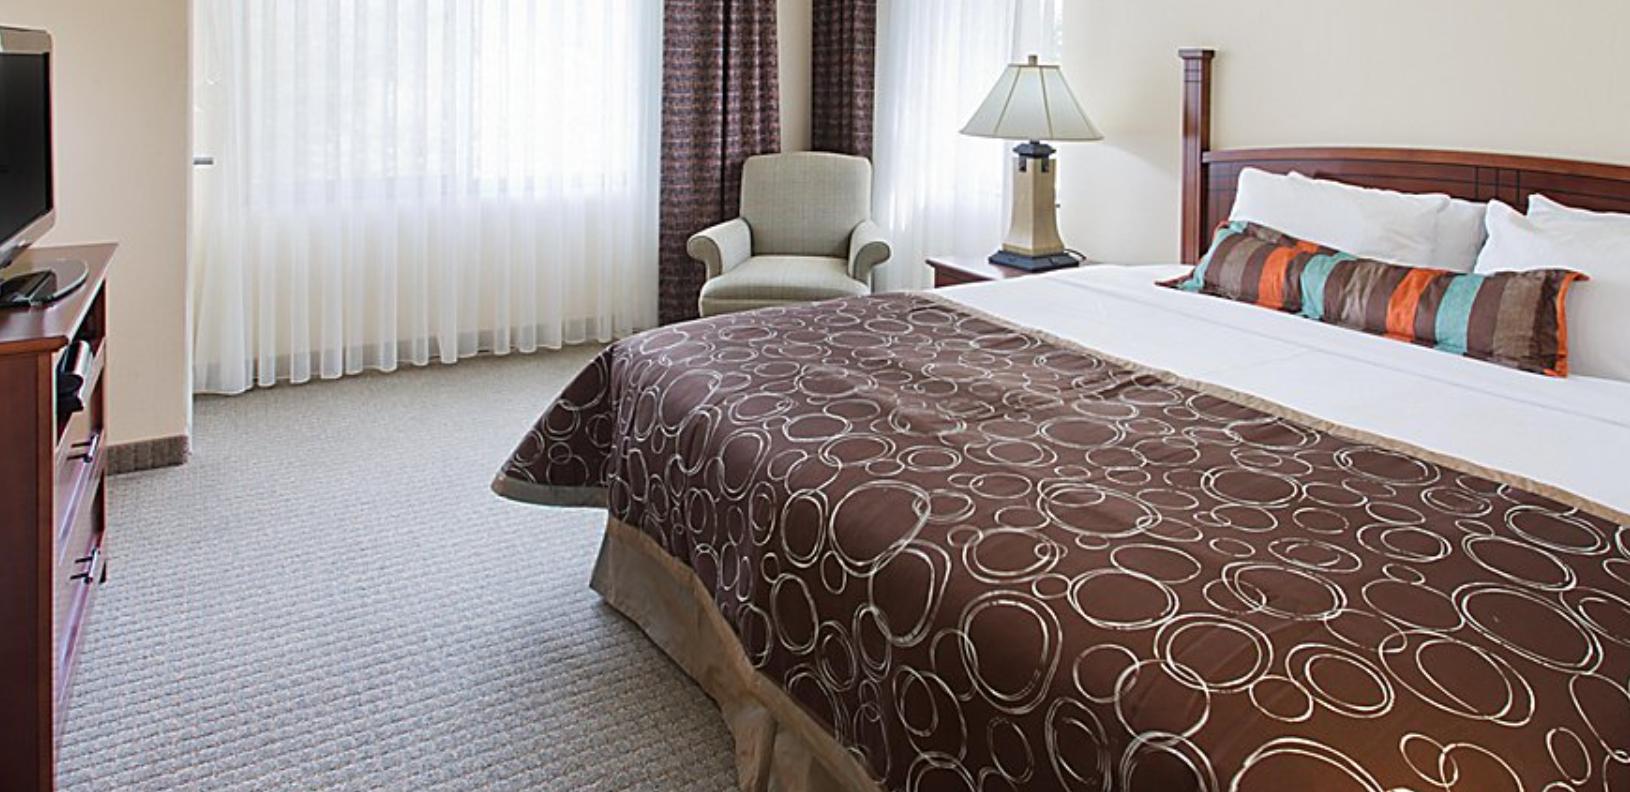 https://www.hotelsbyday.com/_data/default-hotel_image/4/22013/screenshot-2020-09-20-at-9-33-54-pm.png